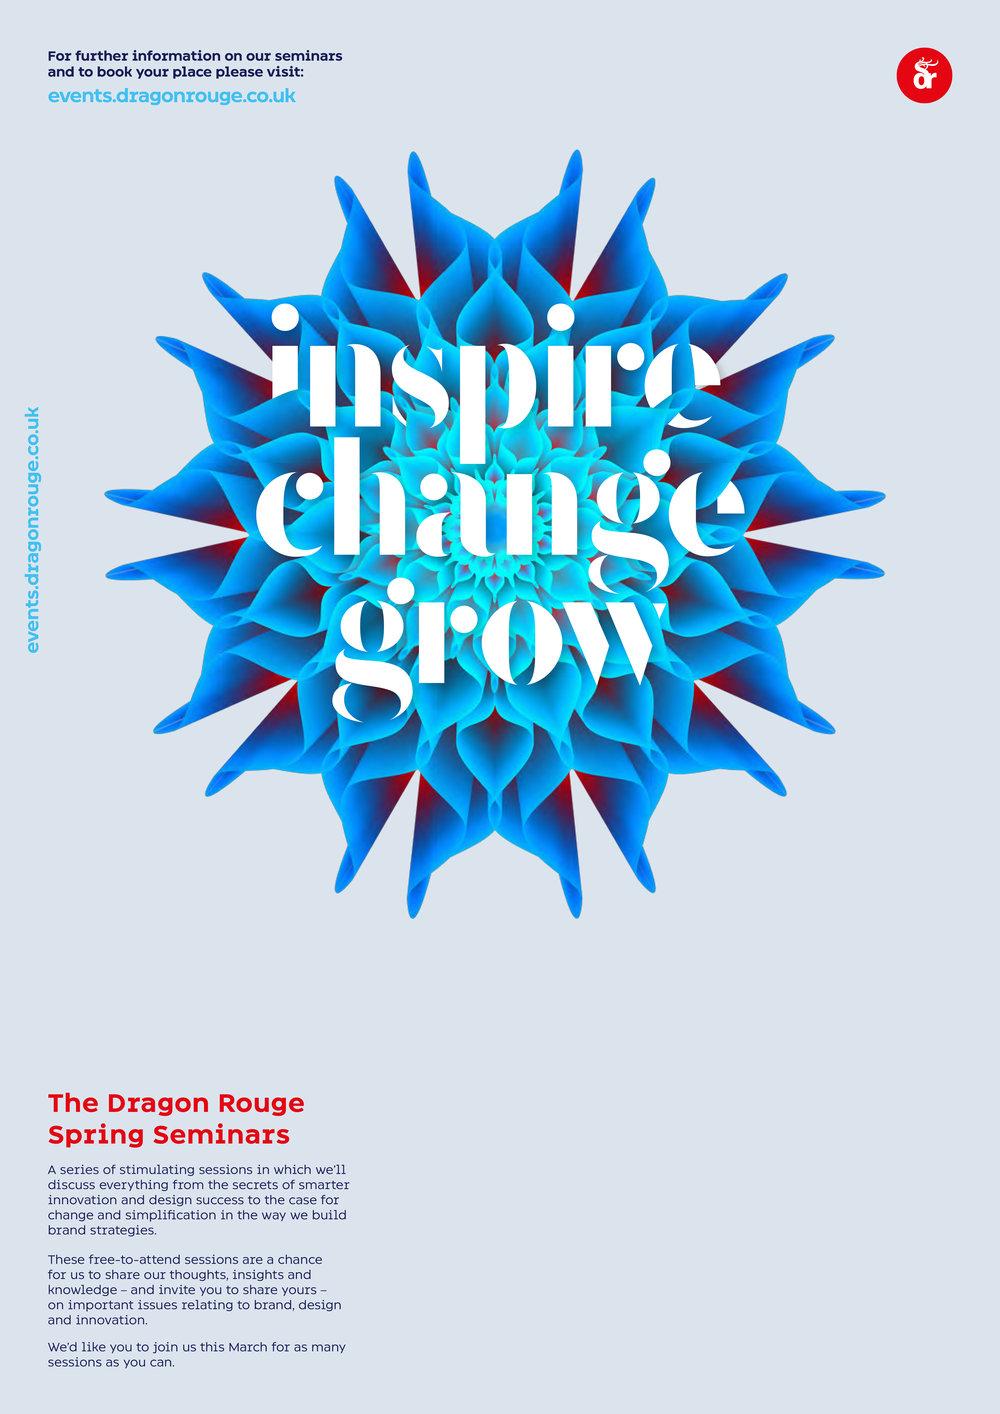 DR_Spring_Seminar_2017_Poster-12.jpg